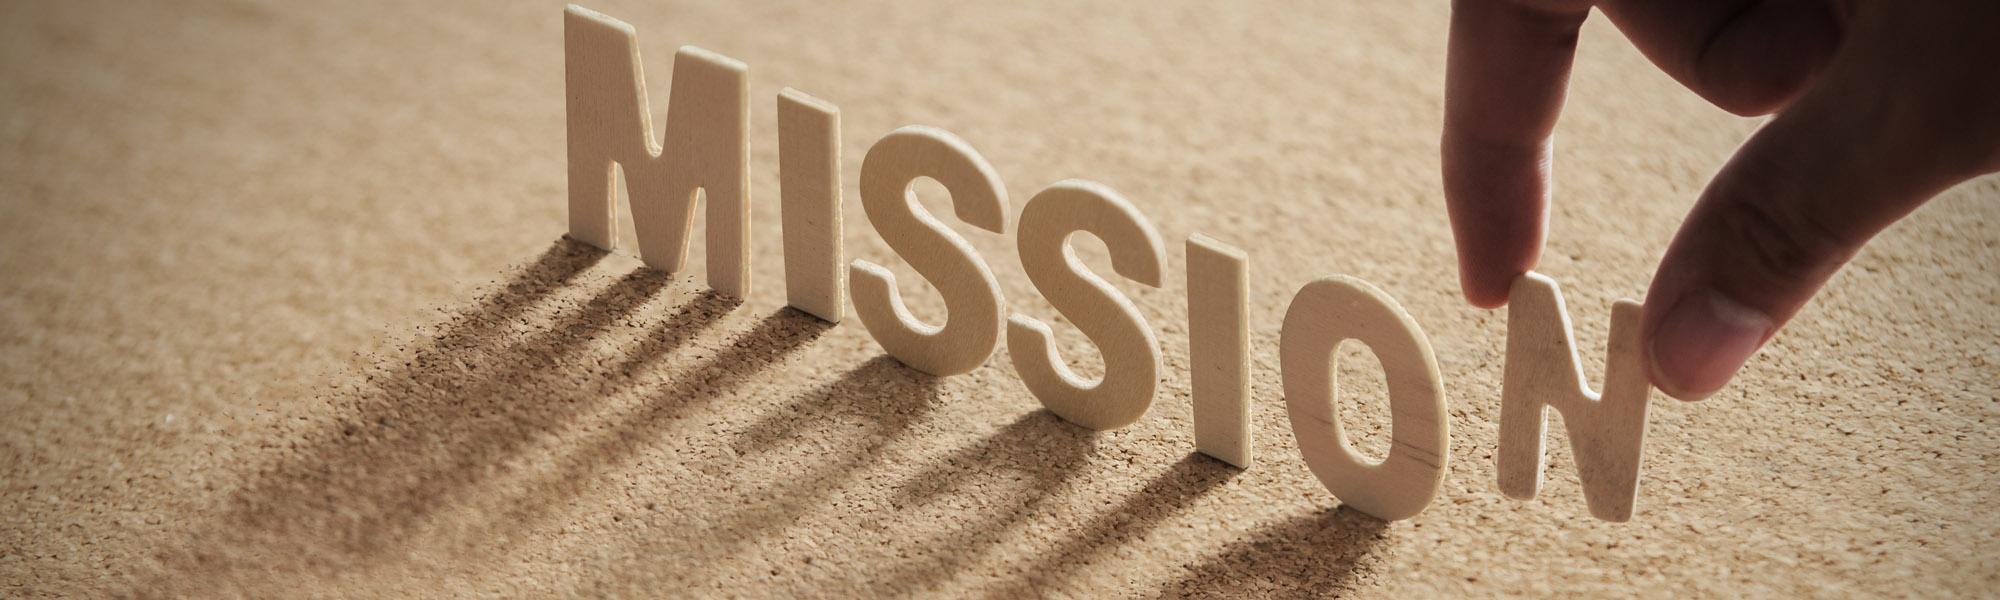 ALPI mission in sand